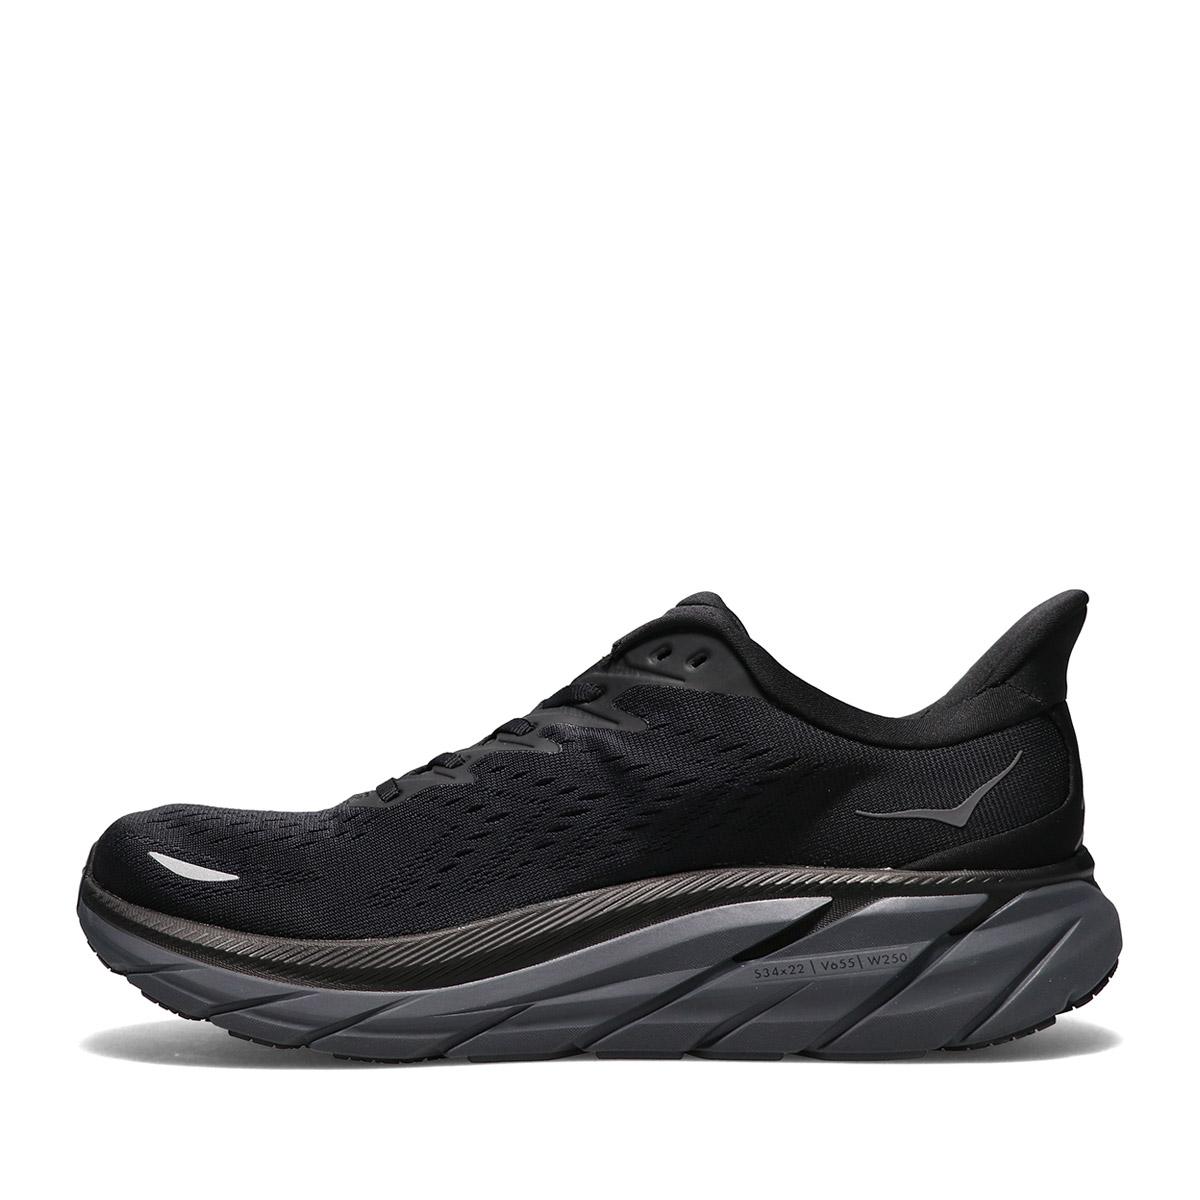 f:id:shoesmaster:20210905210839p:plain